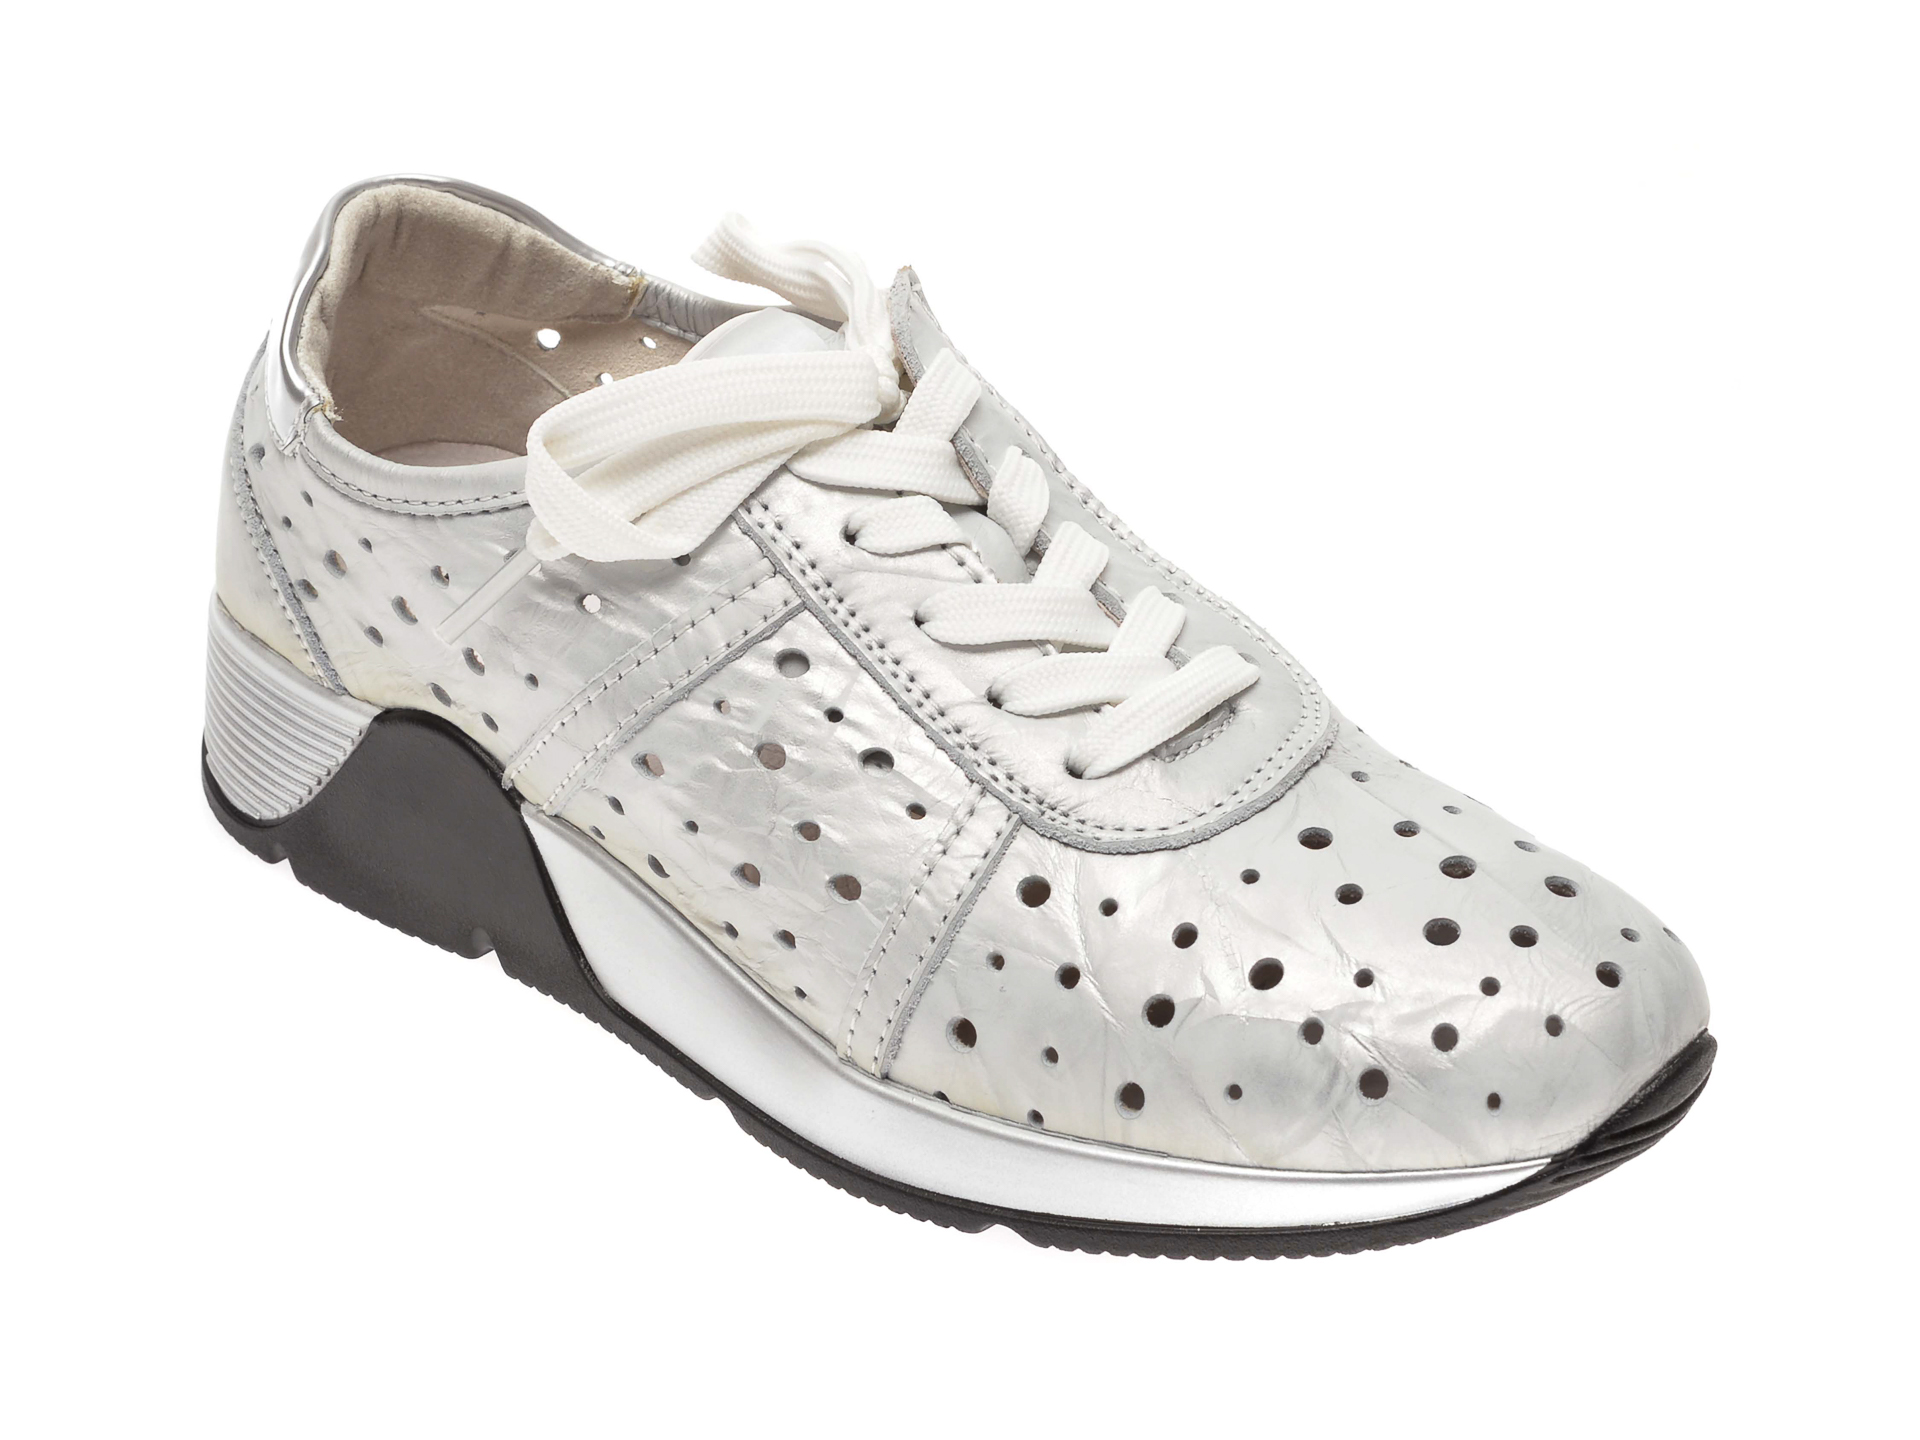 Pantofi Image Argintii, 8595395, Din Piele Naturala